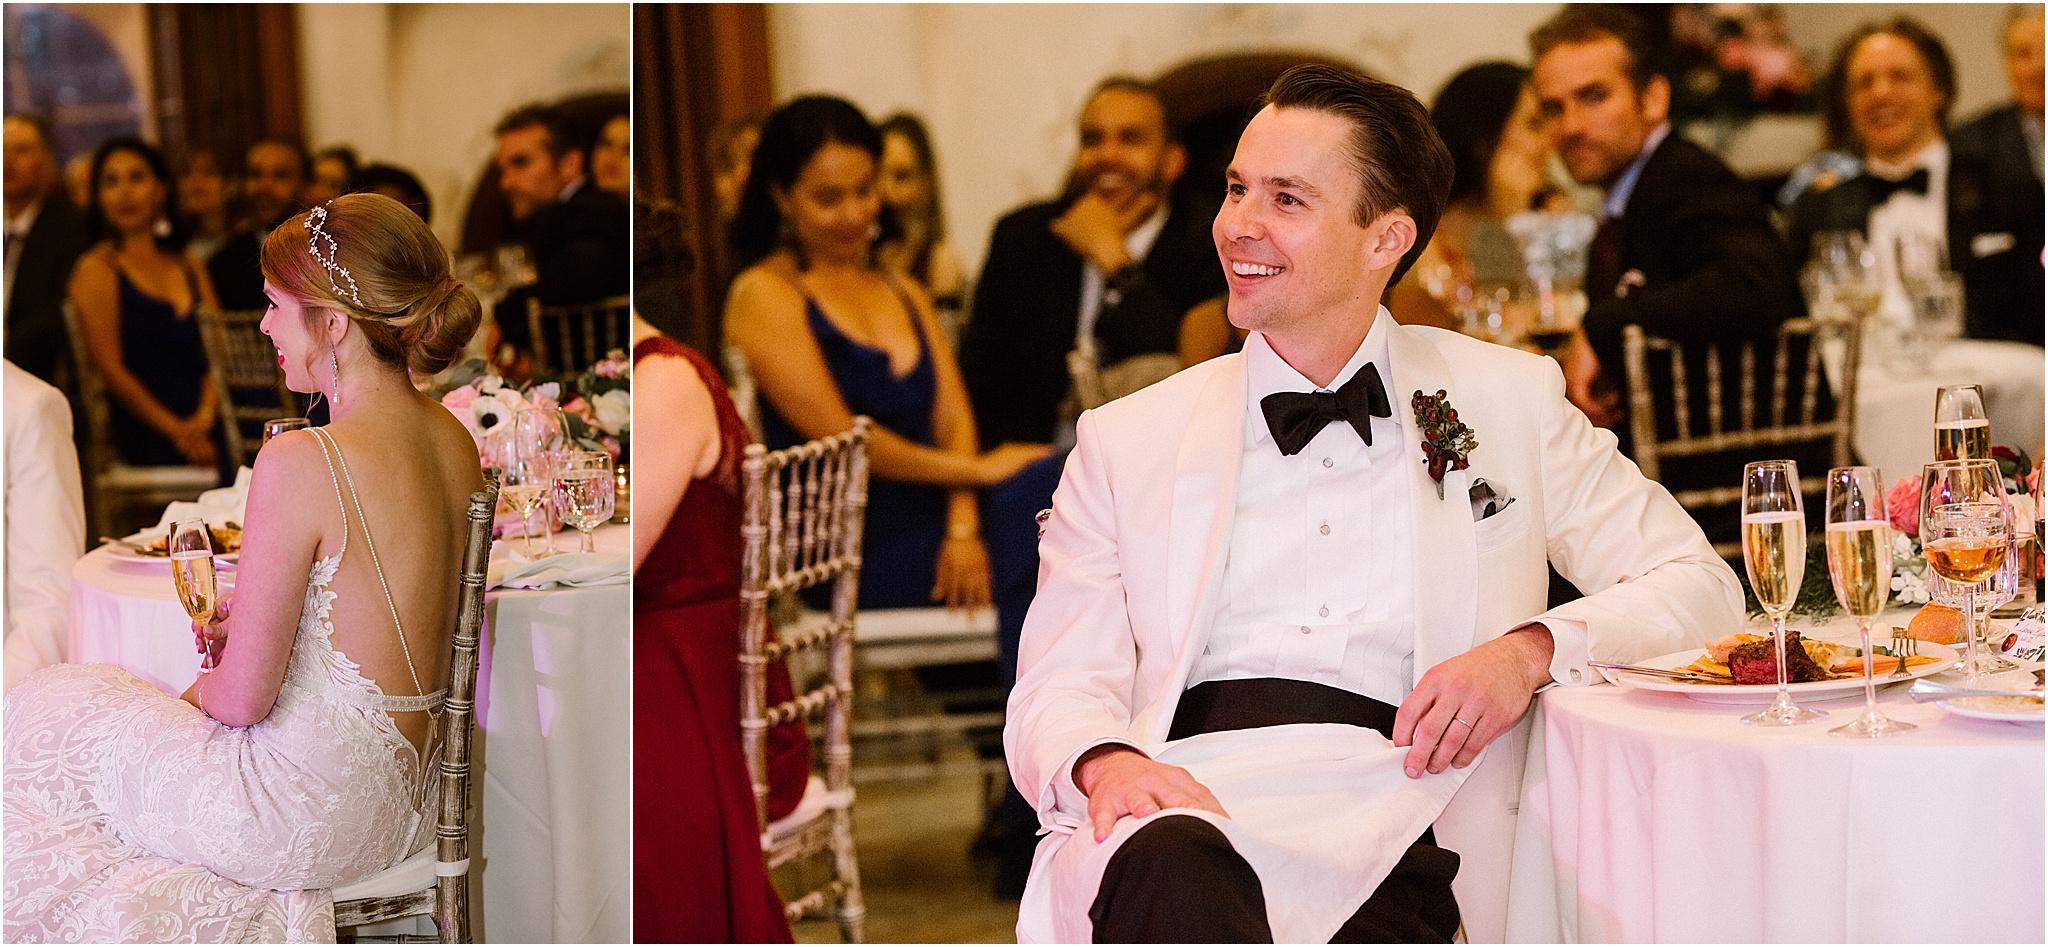 BLUE ROSE PHOTOGRAPHY SANTA FE WEDDING_63